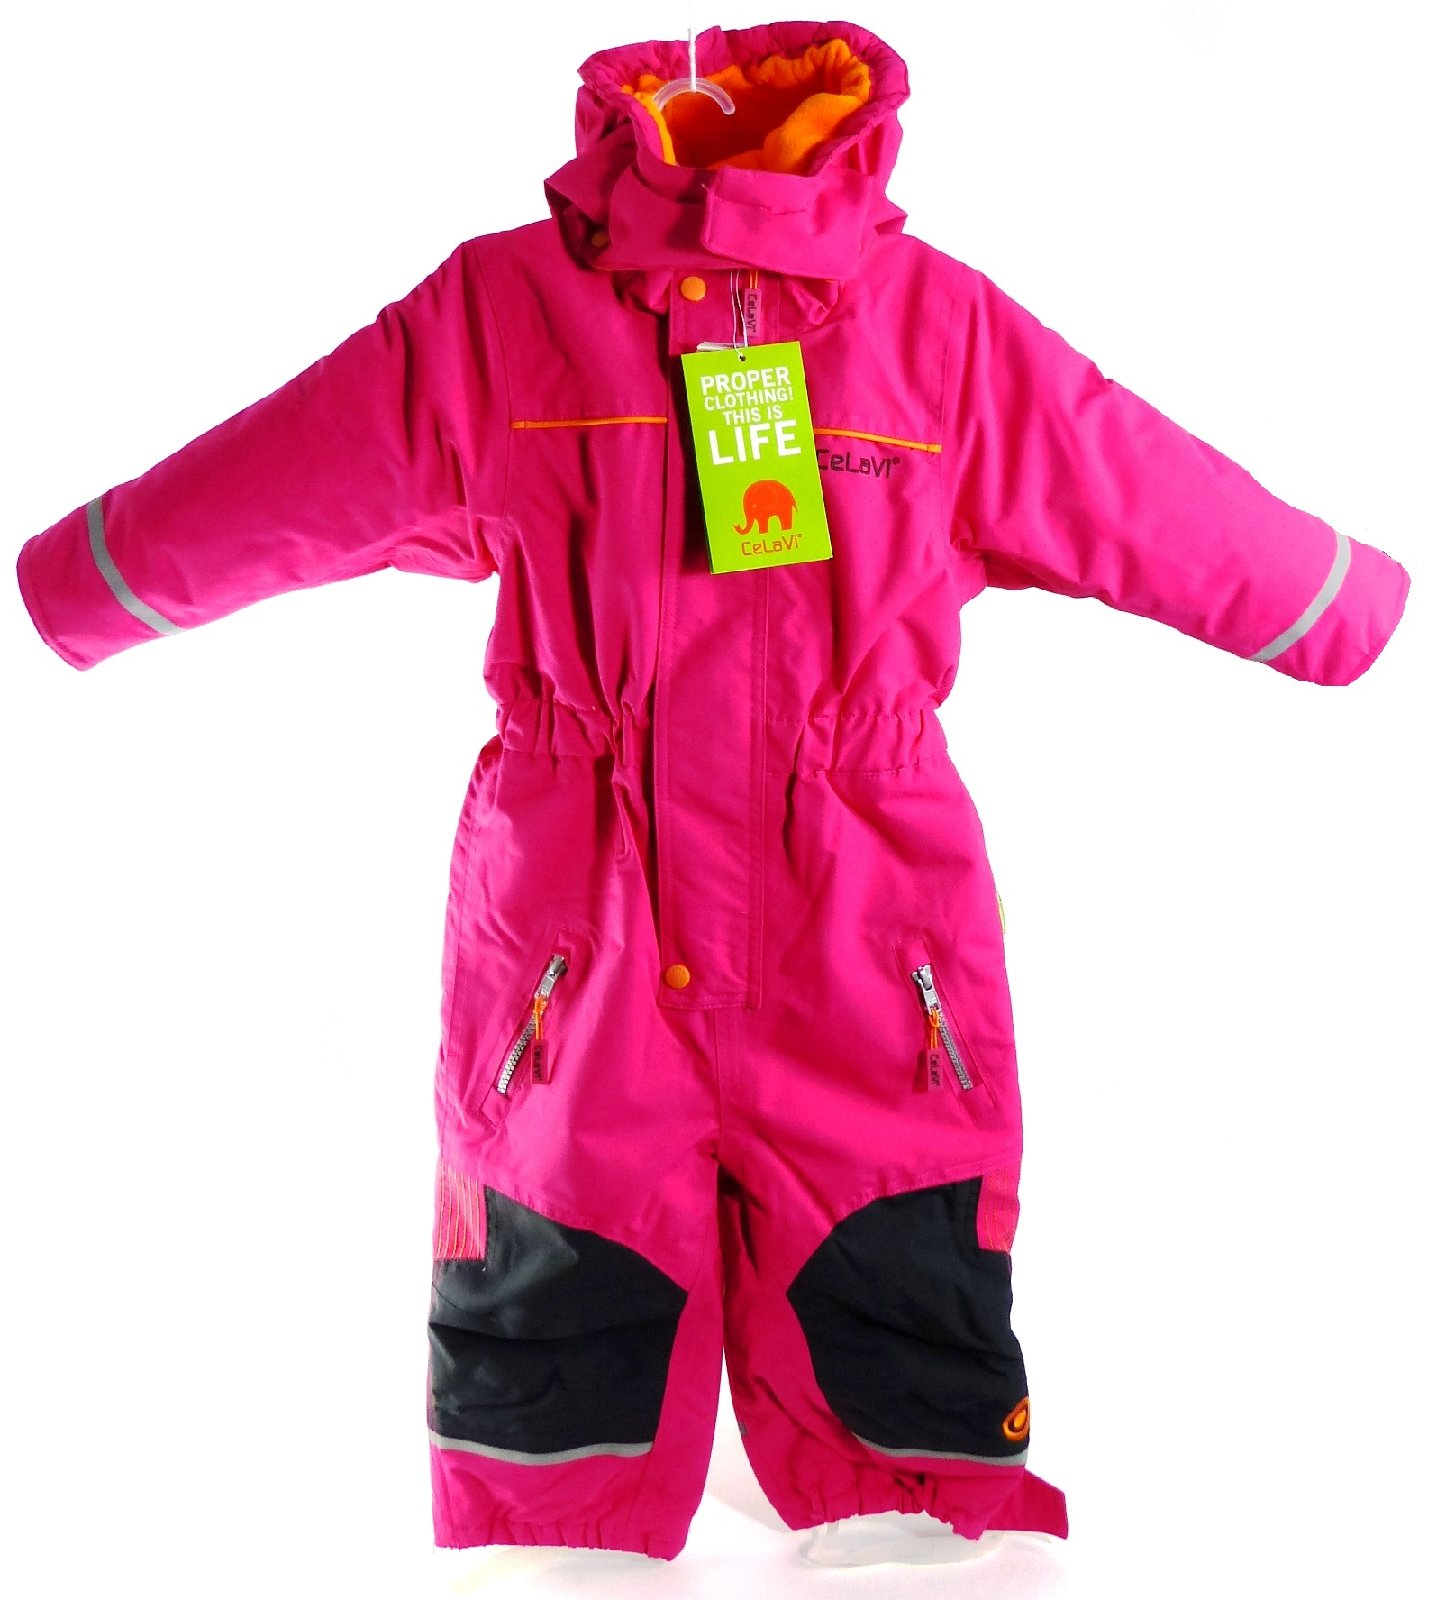 celavi schneeanzug skioverall anzug overall kids gr 92 m dchen winter pink 1124 ebay. Black Bedroom Furniture Sets. Home Design Ideas